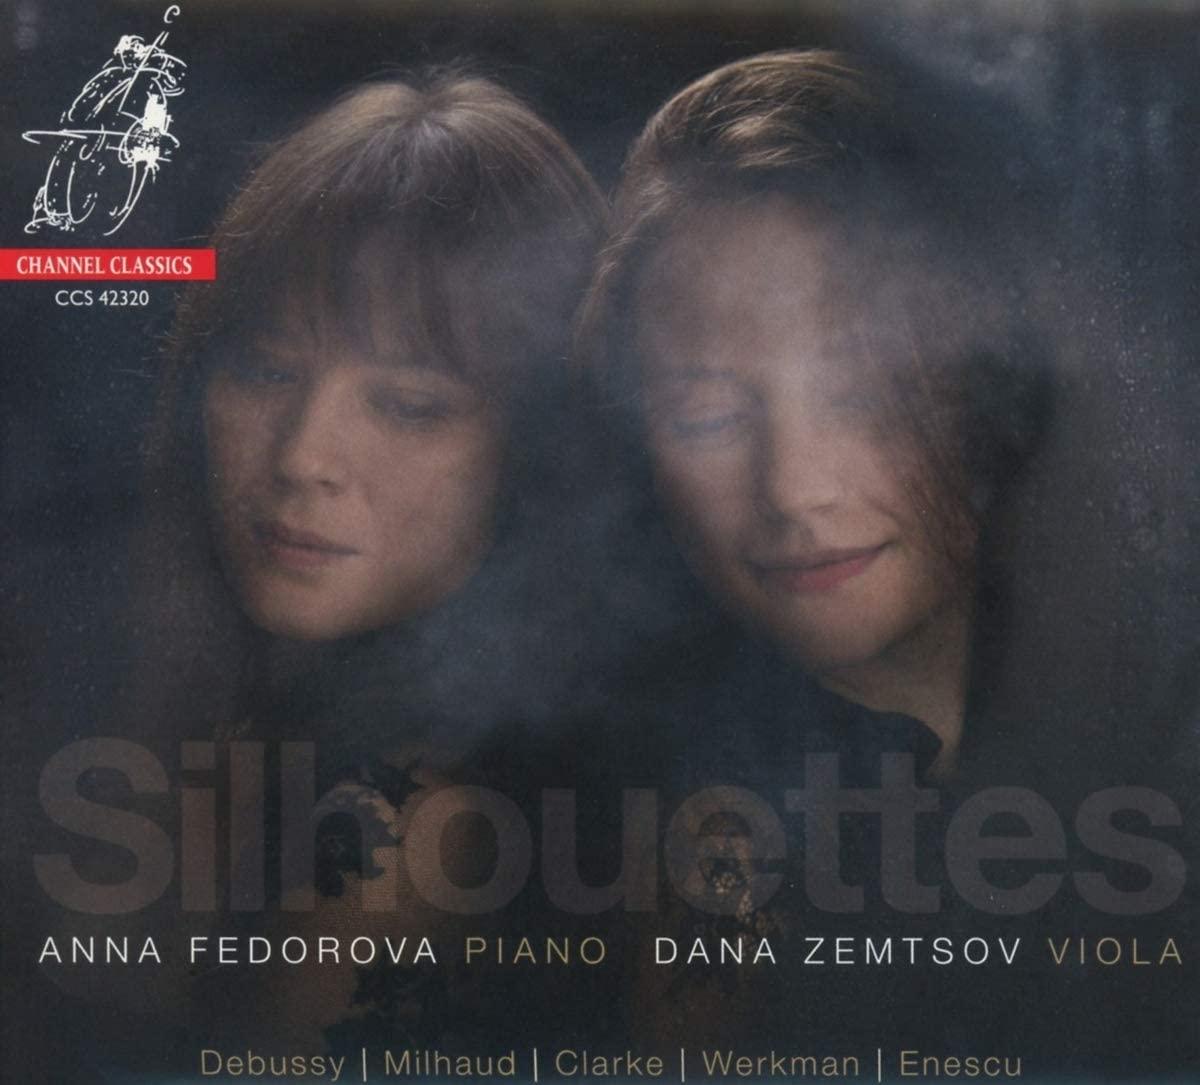 Review of Dana Zemtsov; Anna Fedorova: Silhouettes